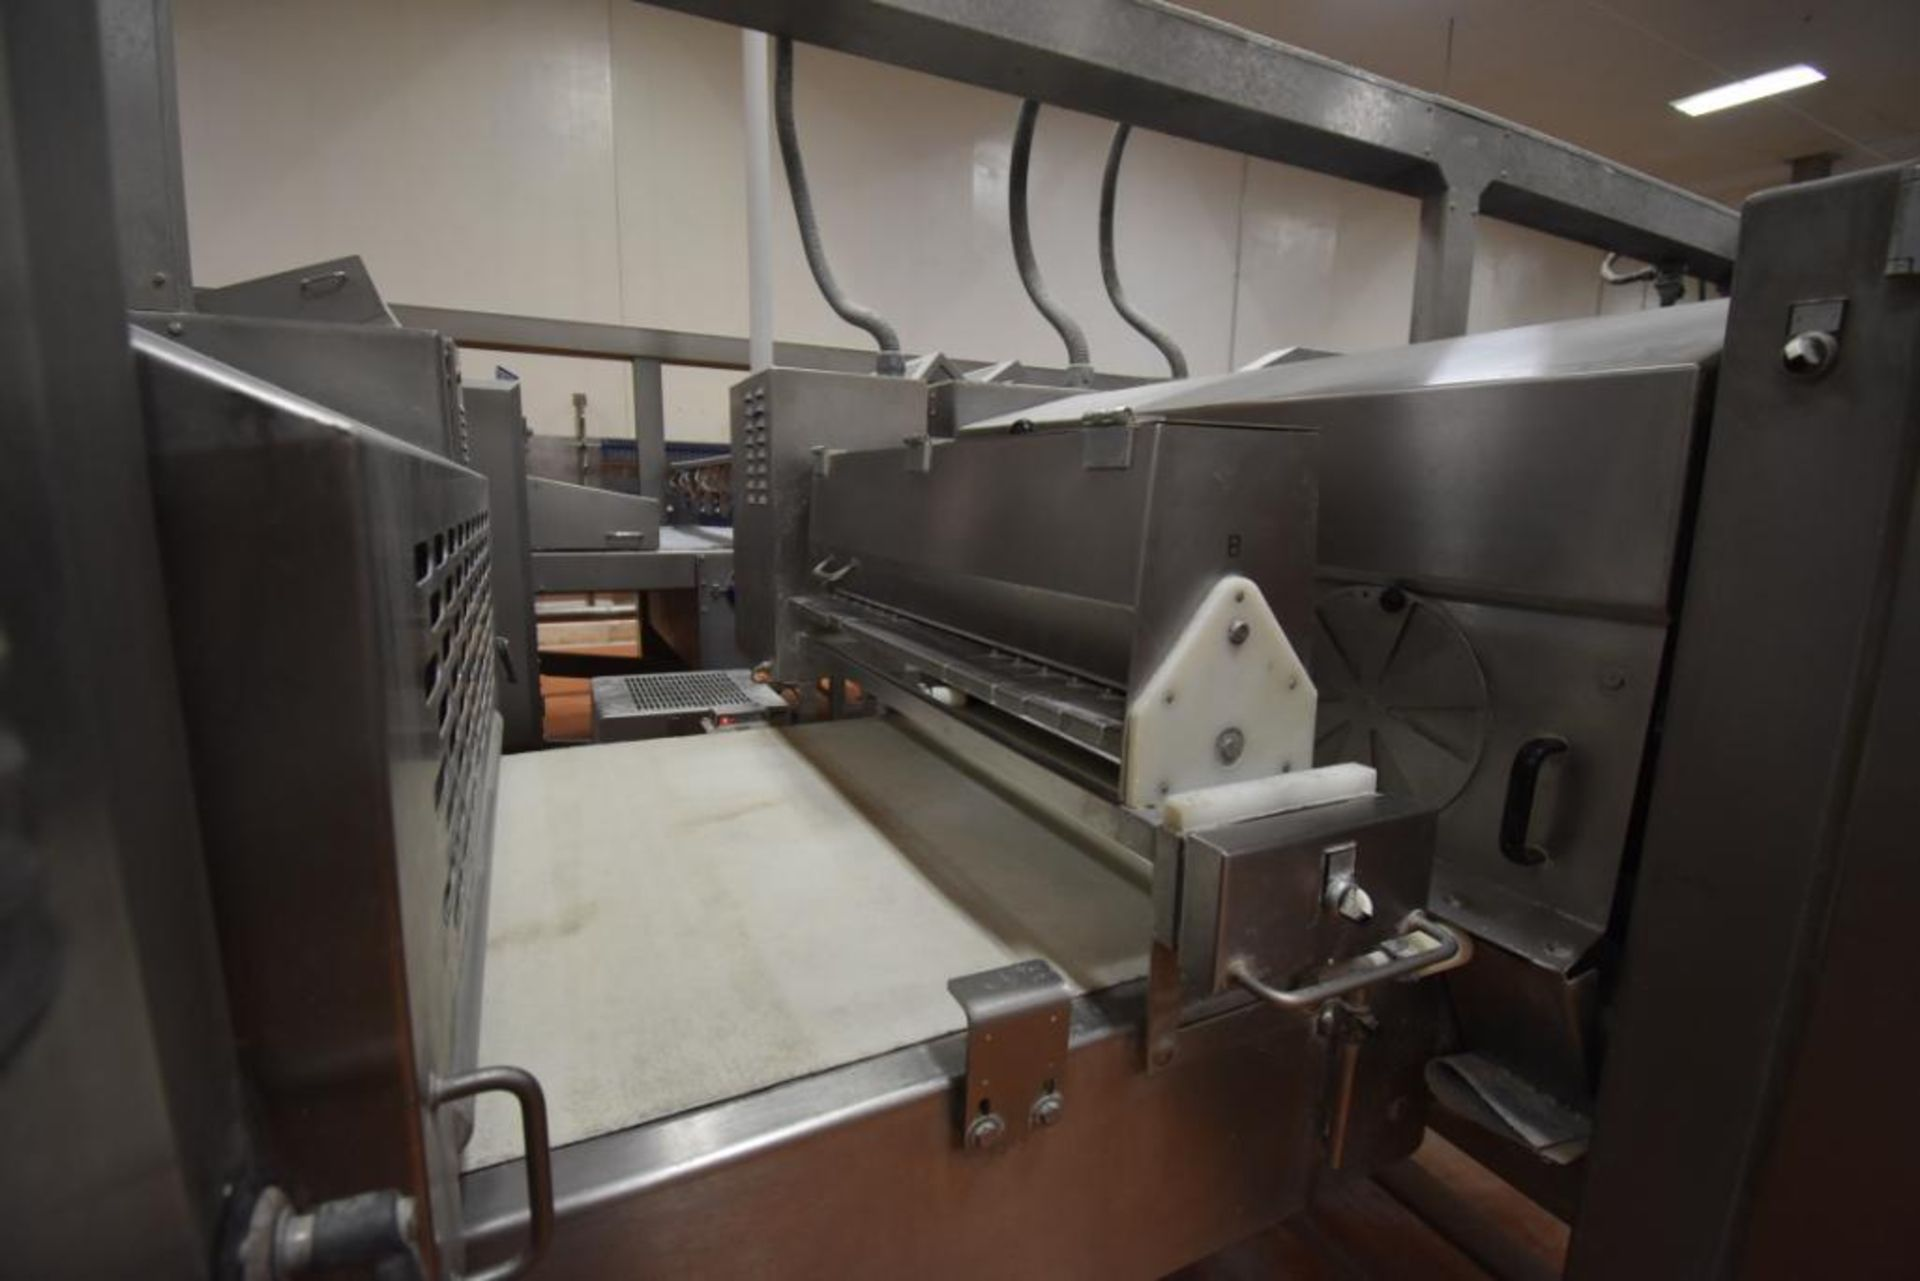 2007 Fritsch Laminator 3000 dough line - Image 67 of 280